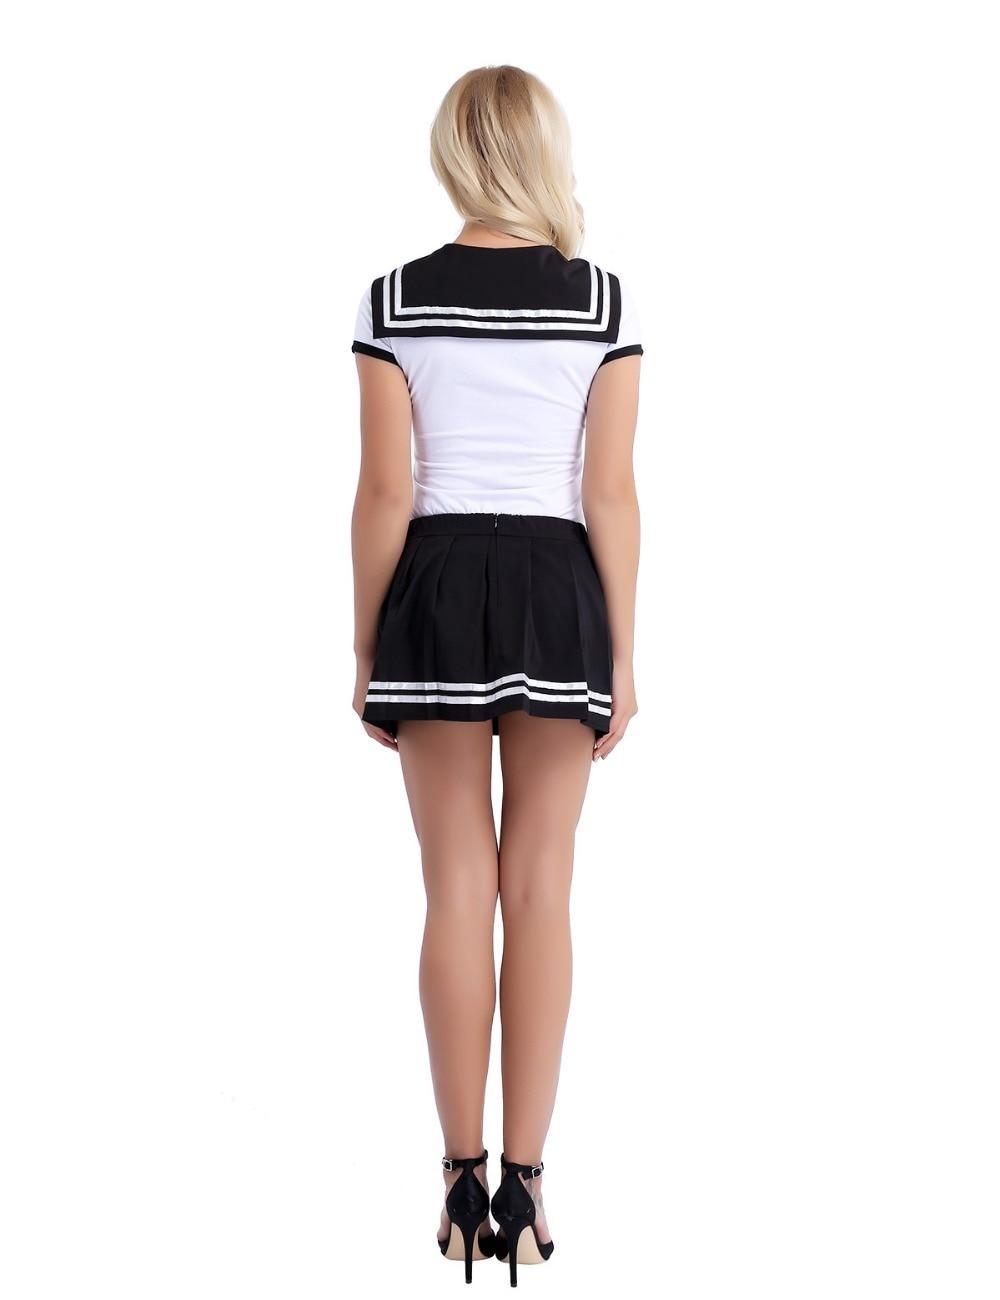 d92982e6ddc 2019 Women Adult Cotton Baby Diaper Lover School Girls Snap Crotch ...